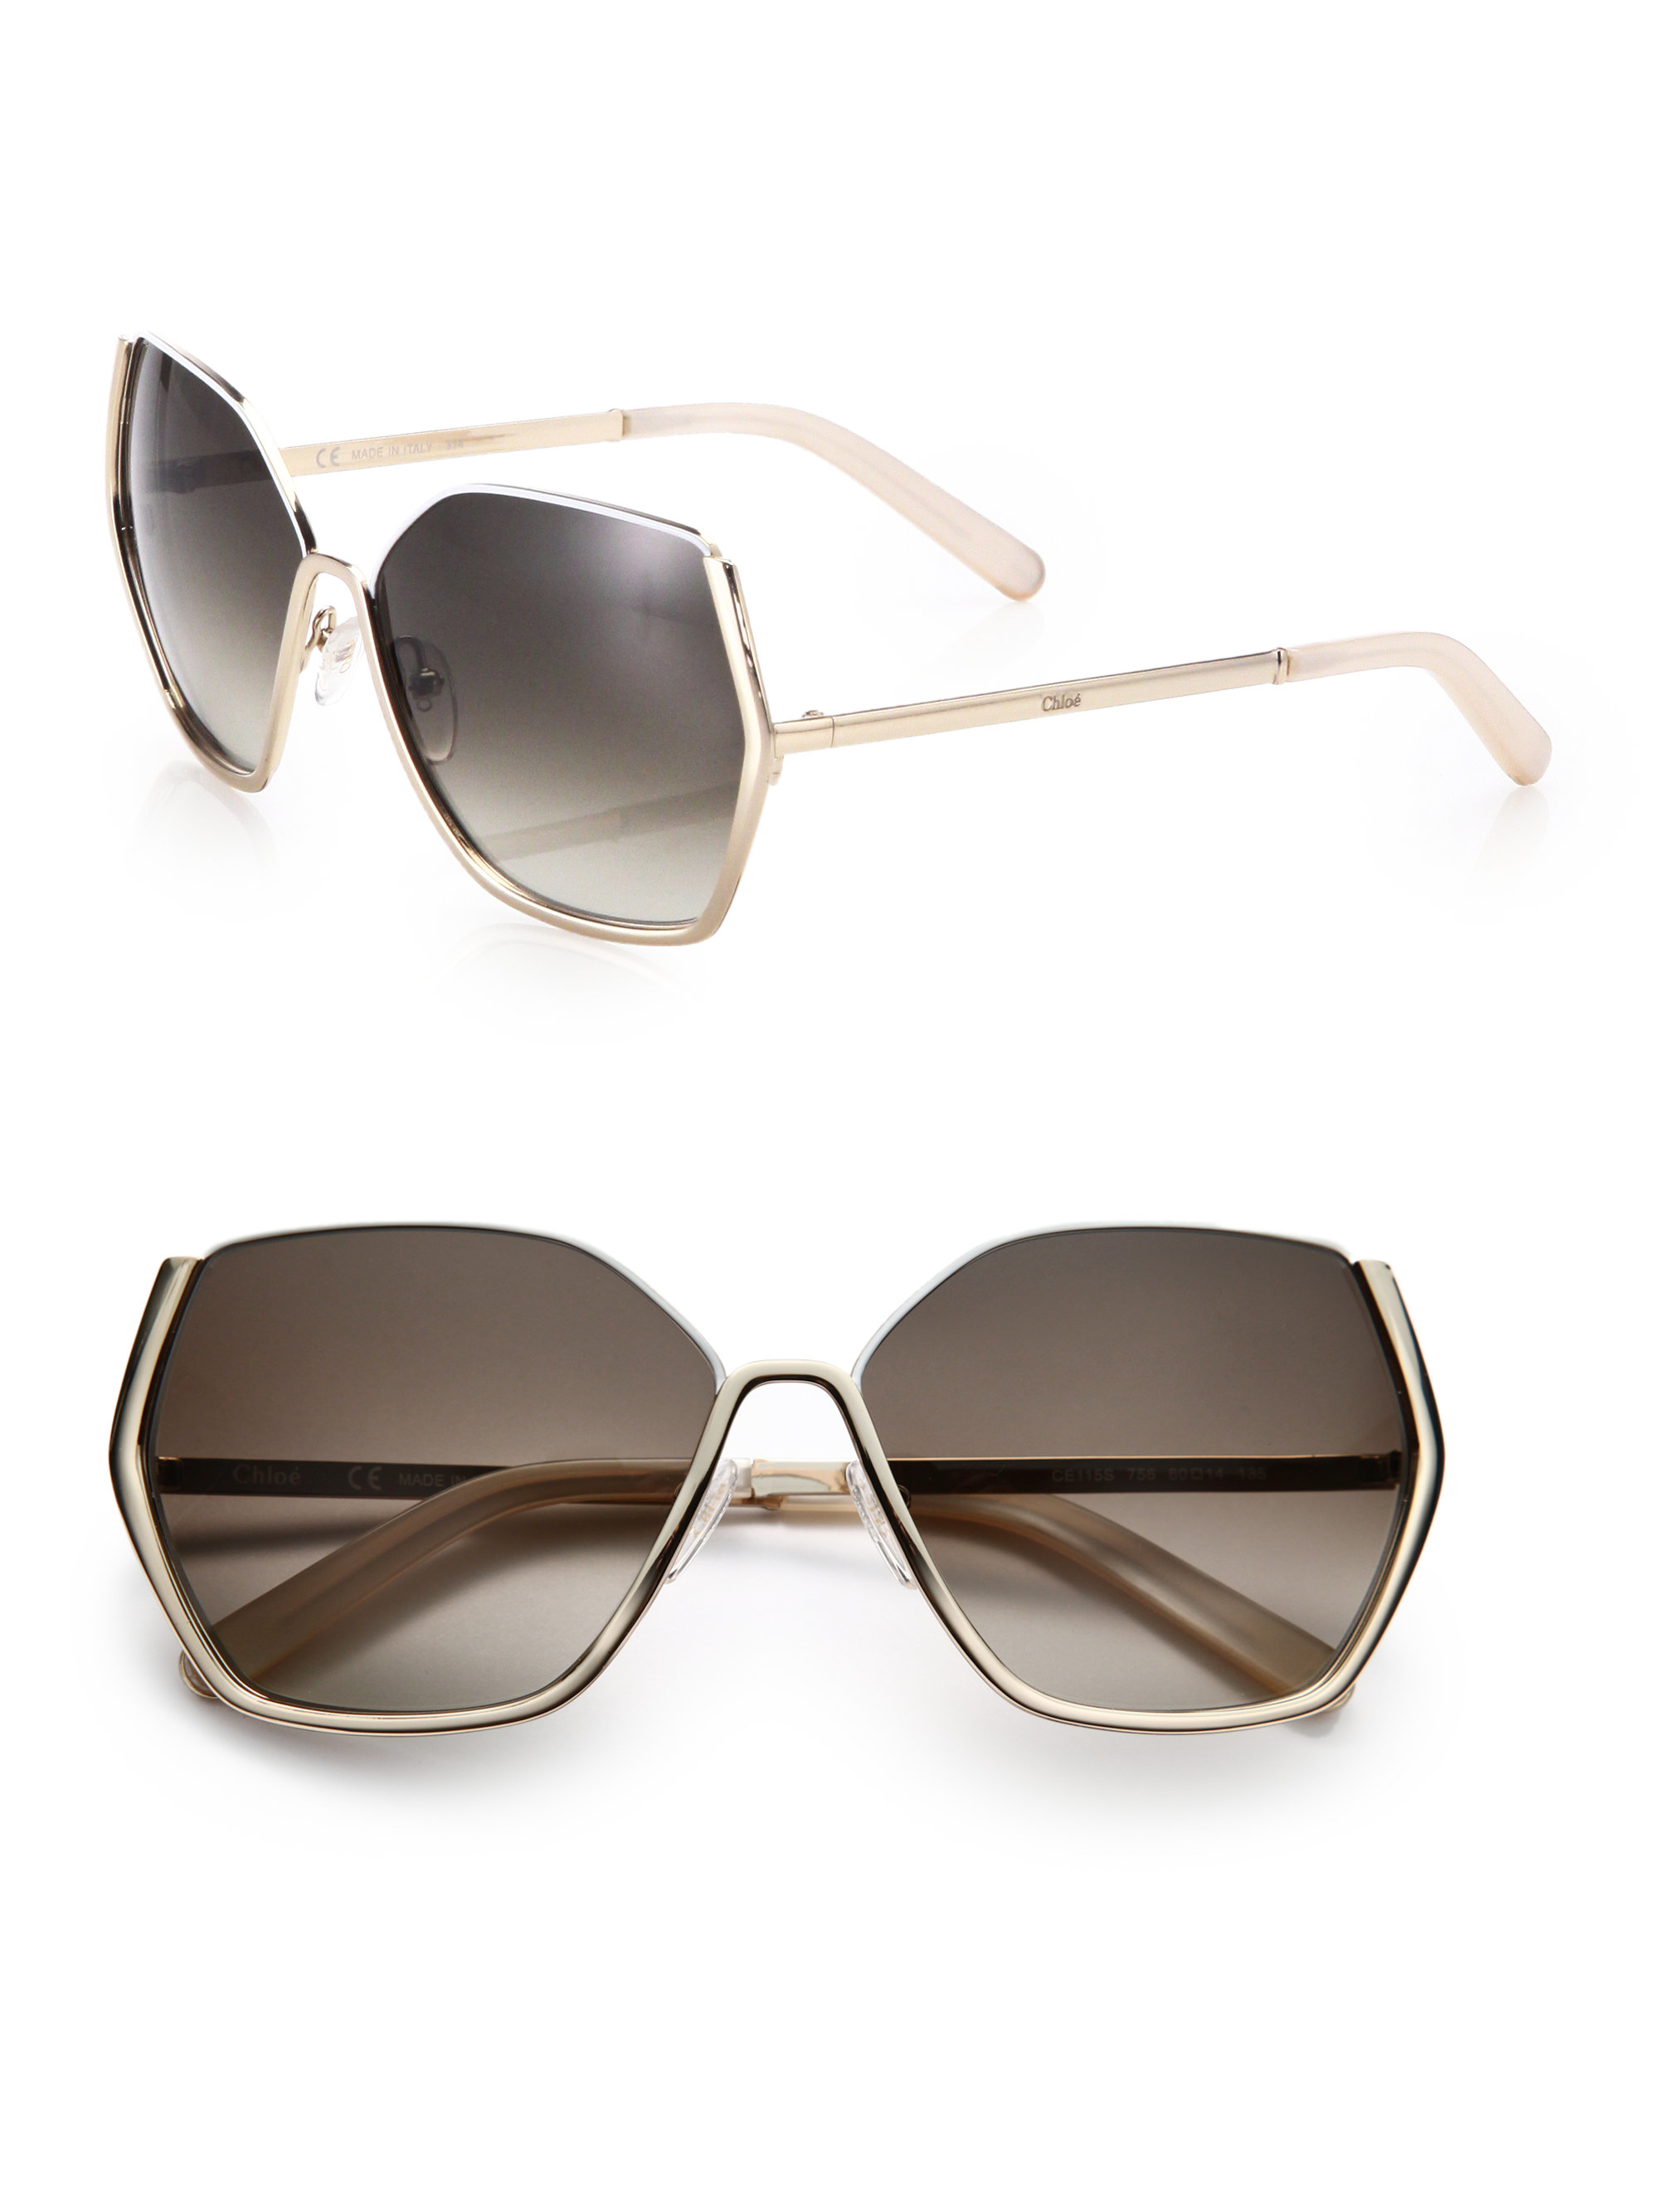 Chloe Gold Frame Sunglasses : Chloe 60mm Square Sunglasses in Metallic Lyst